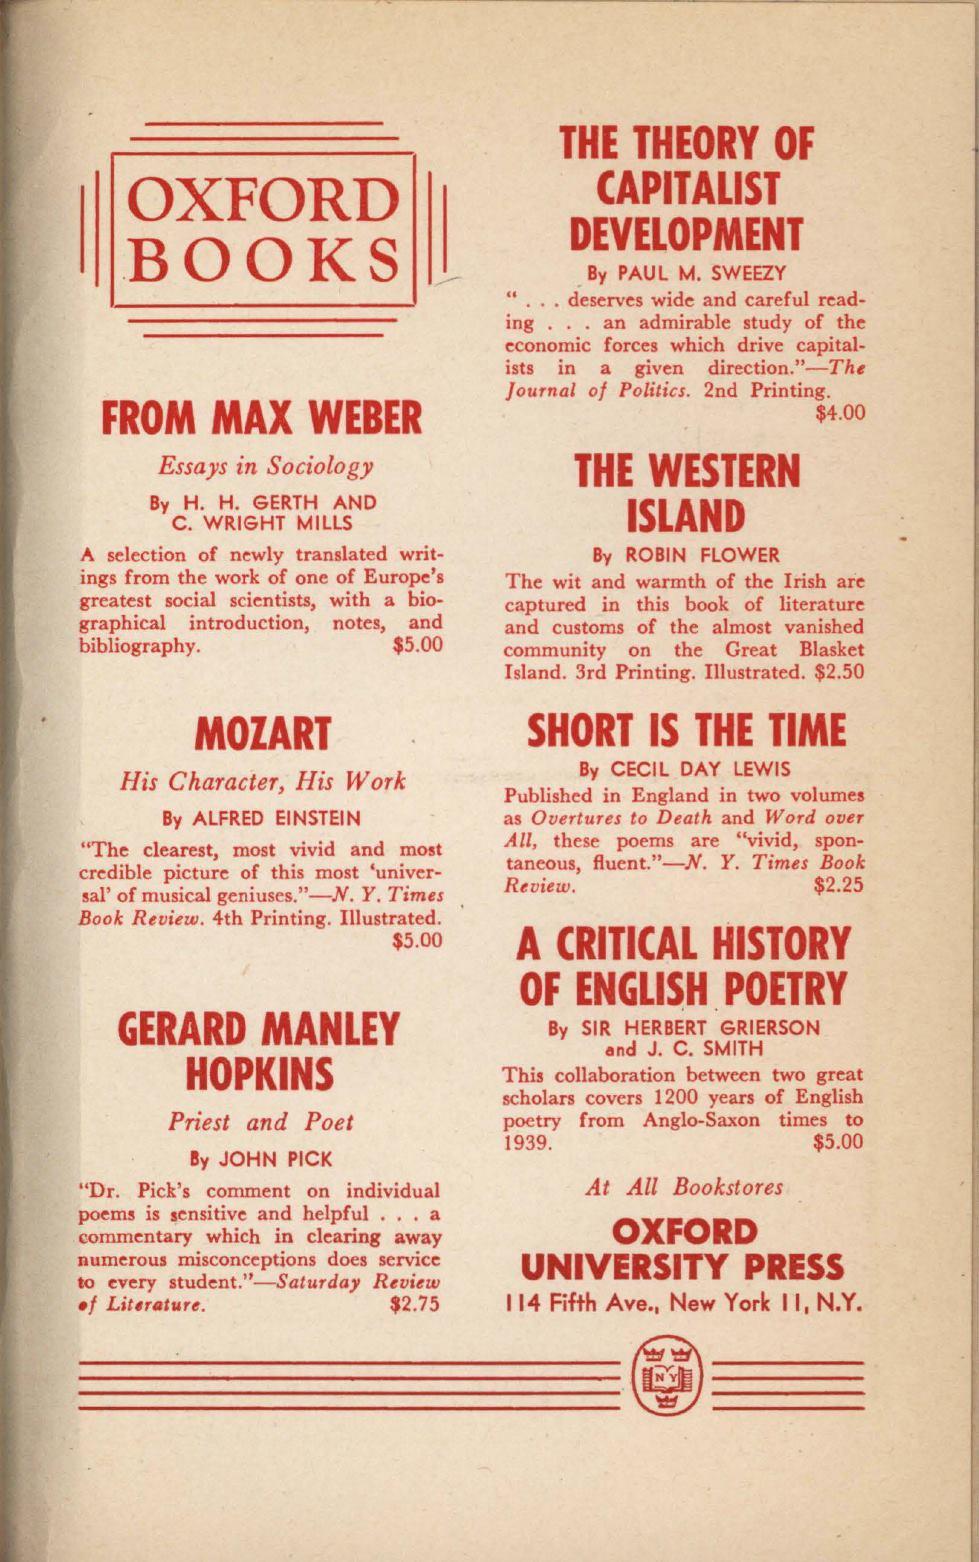 Vol 13 No 4 1946